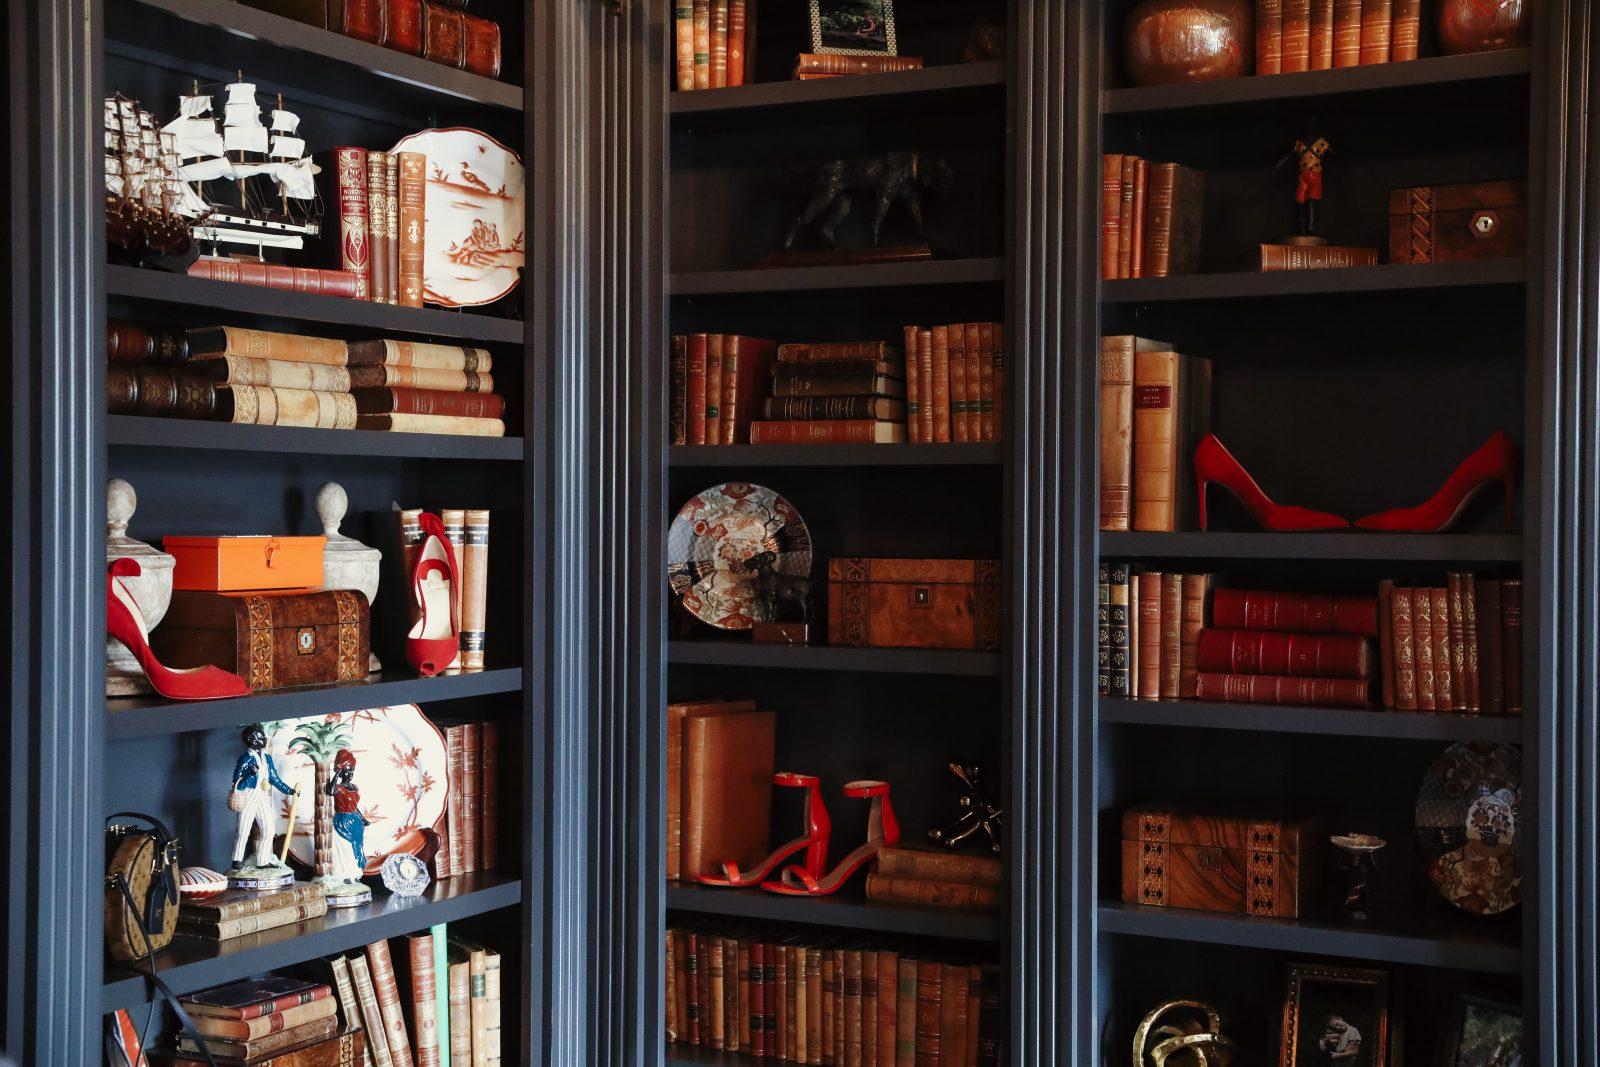 Vintage library aesthetics from Elizabeth Allen photoshoot